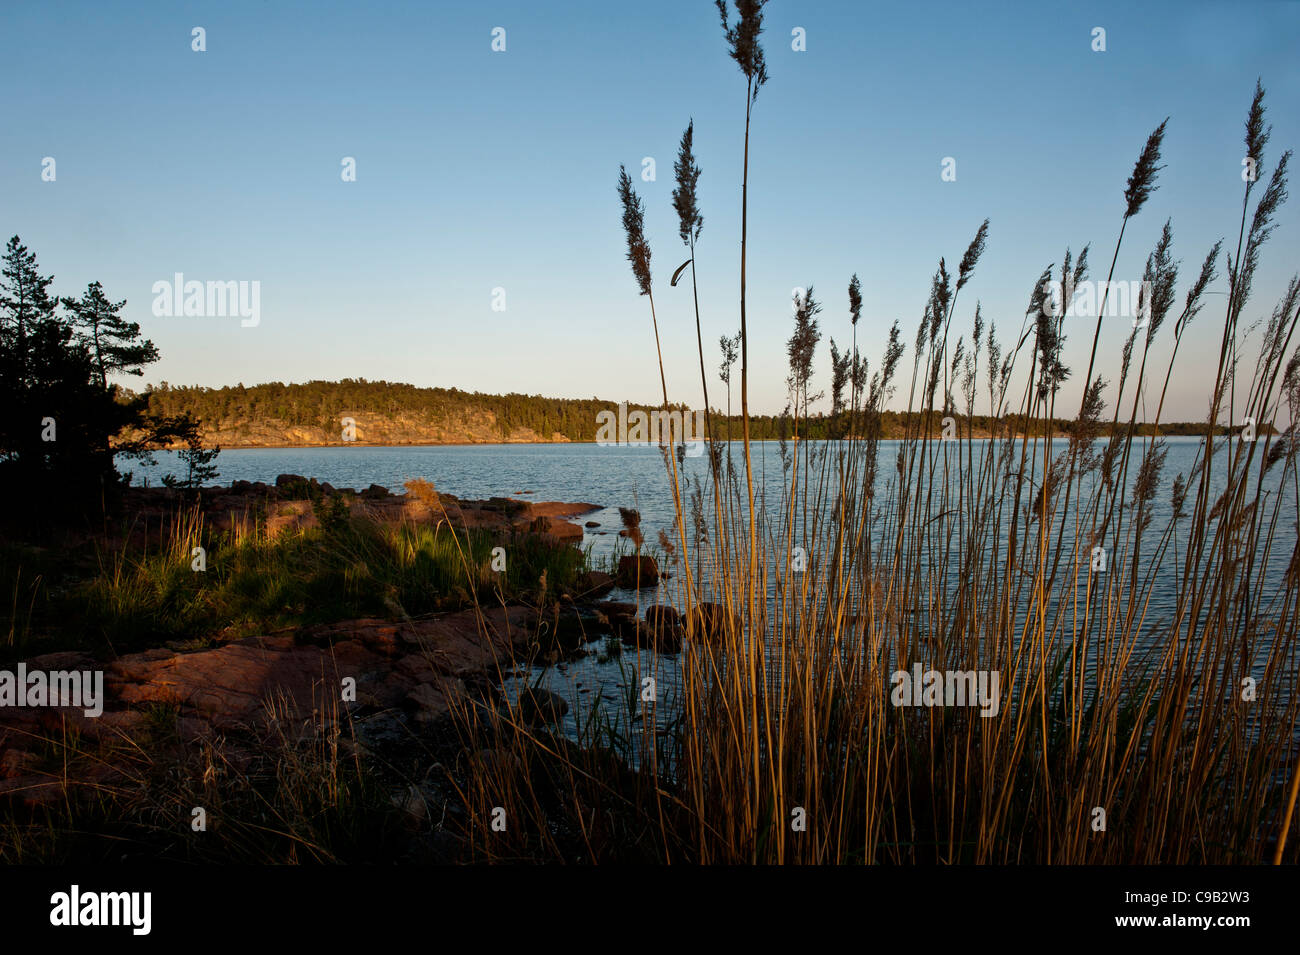 Finnish lake Aland Island Finland - Stock Image